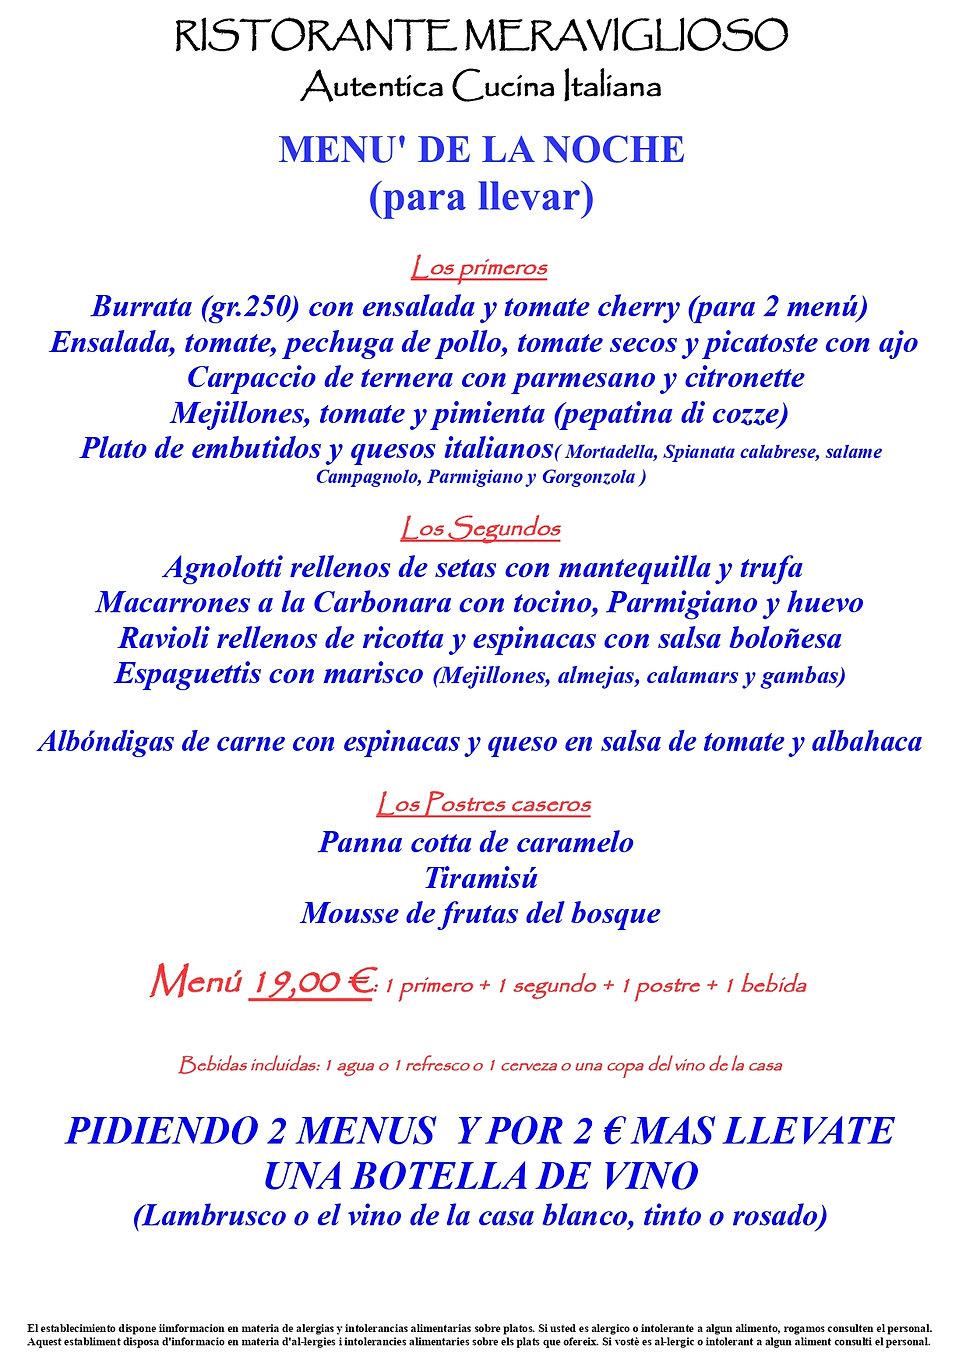 Menu para llevar 19 euro_page-0001 (2).j